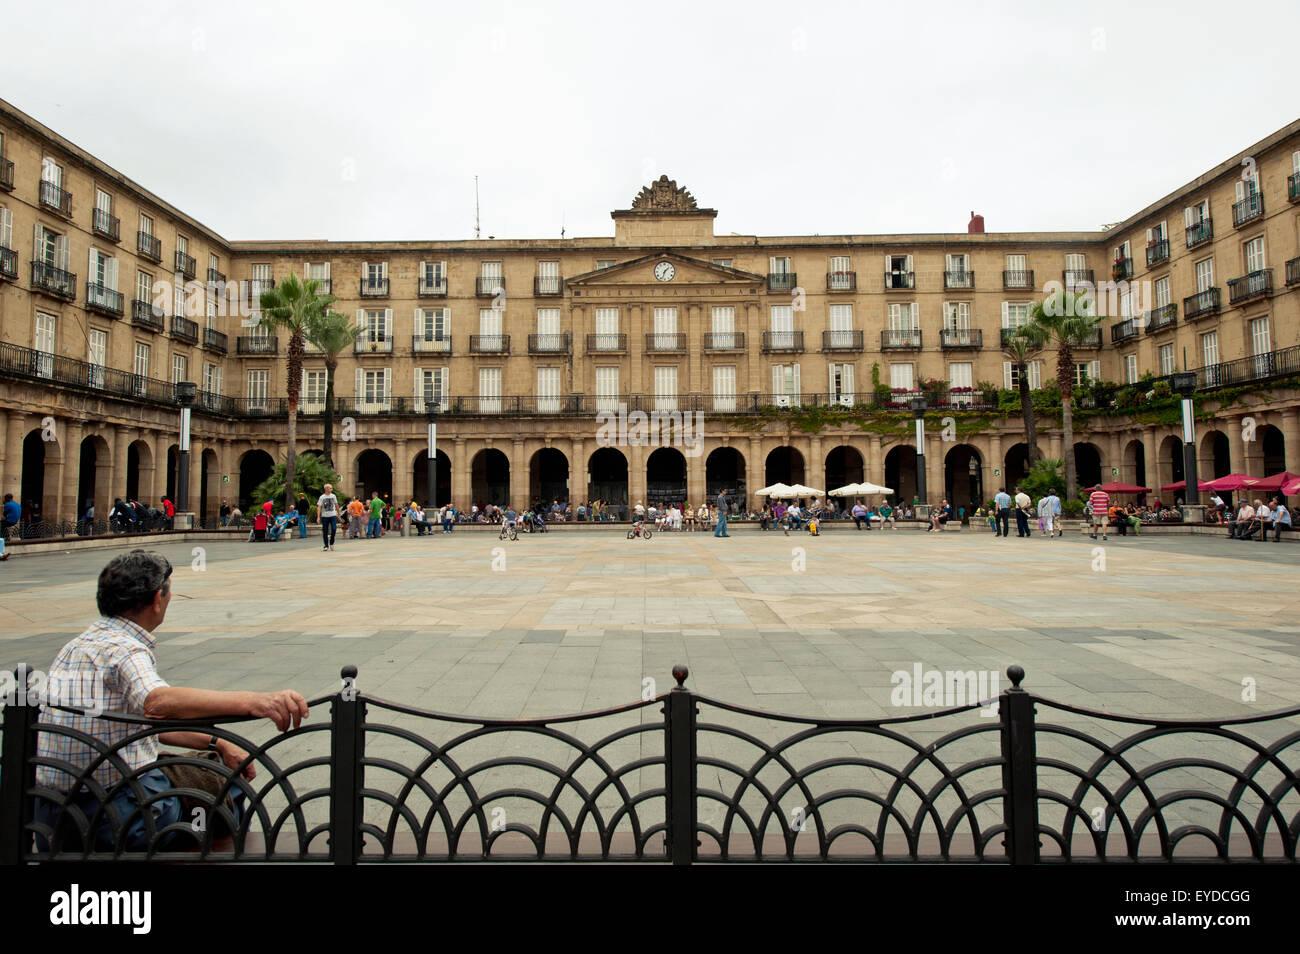 Real Academia De La Lengua Vasca In Plaza Nueva, Bilbao, Basque Country, Spain - Stock Image